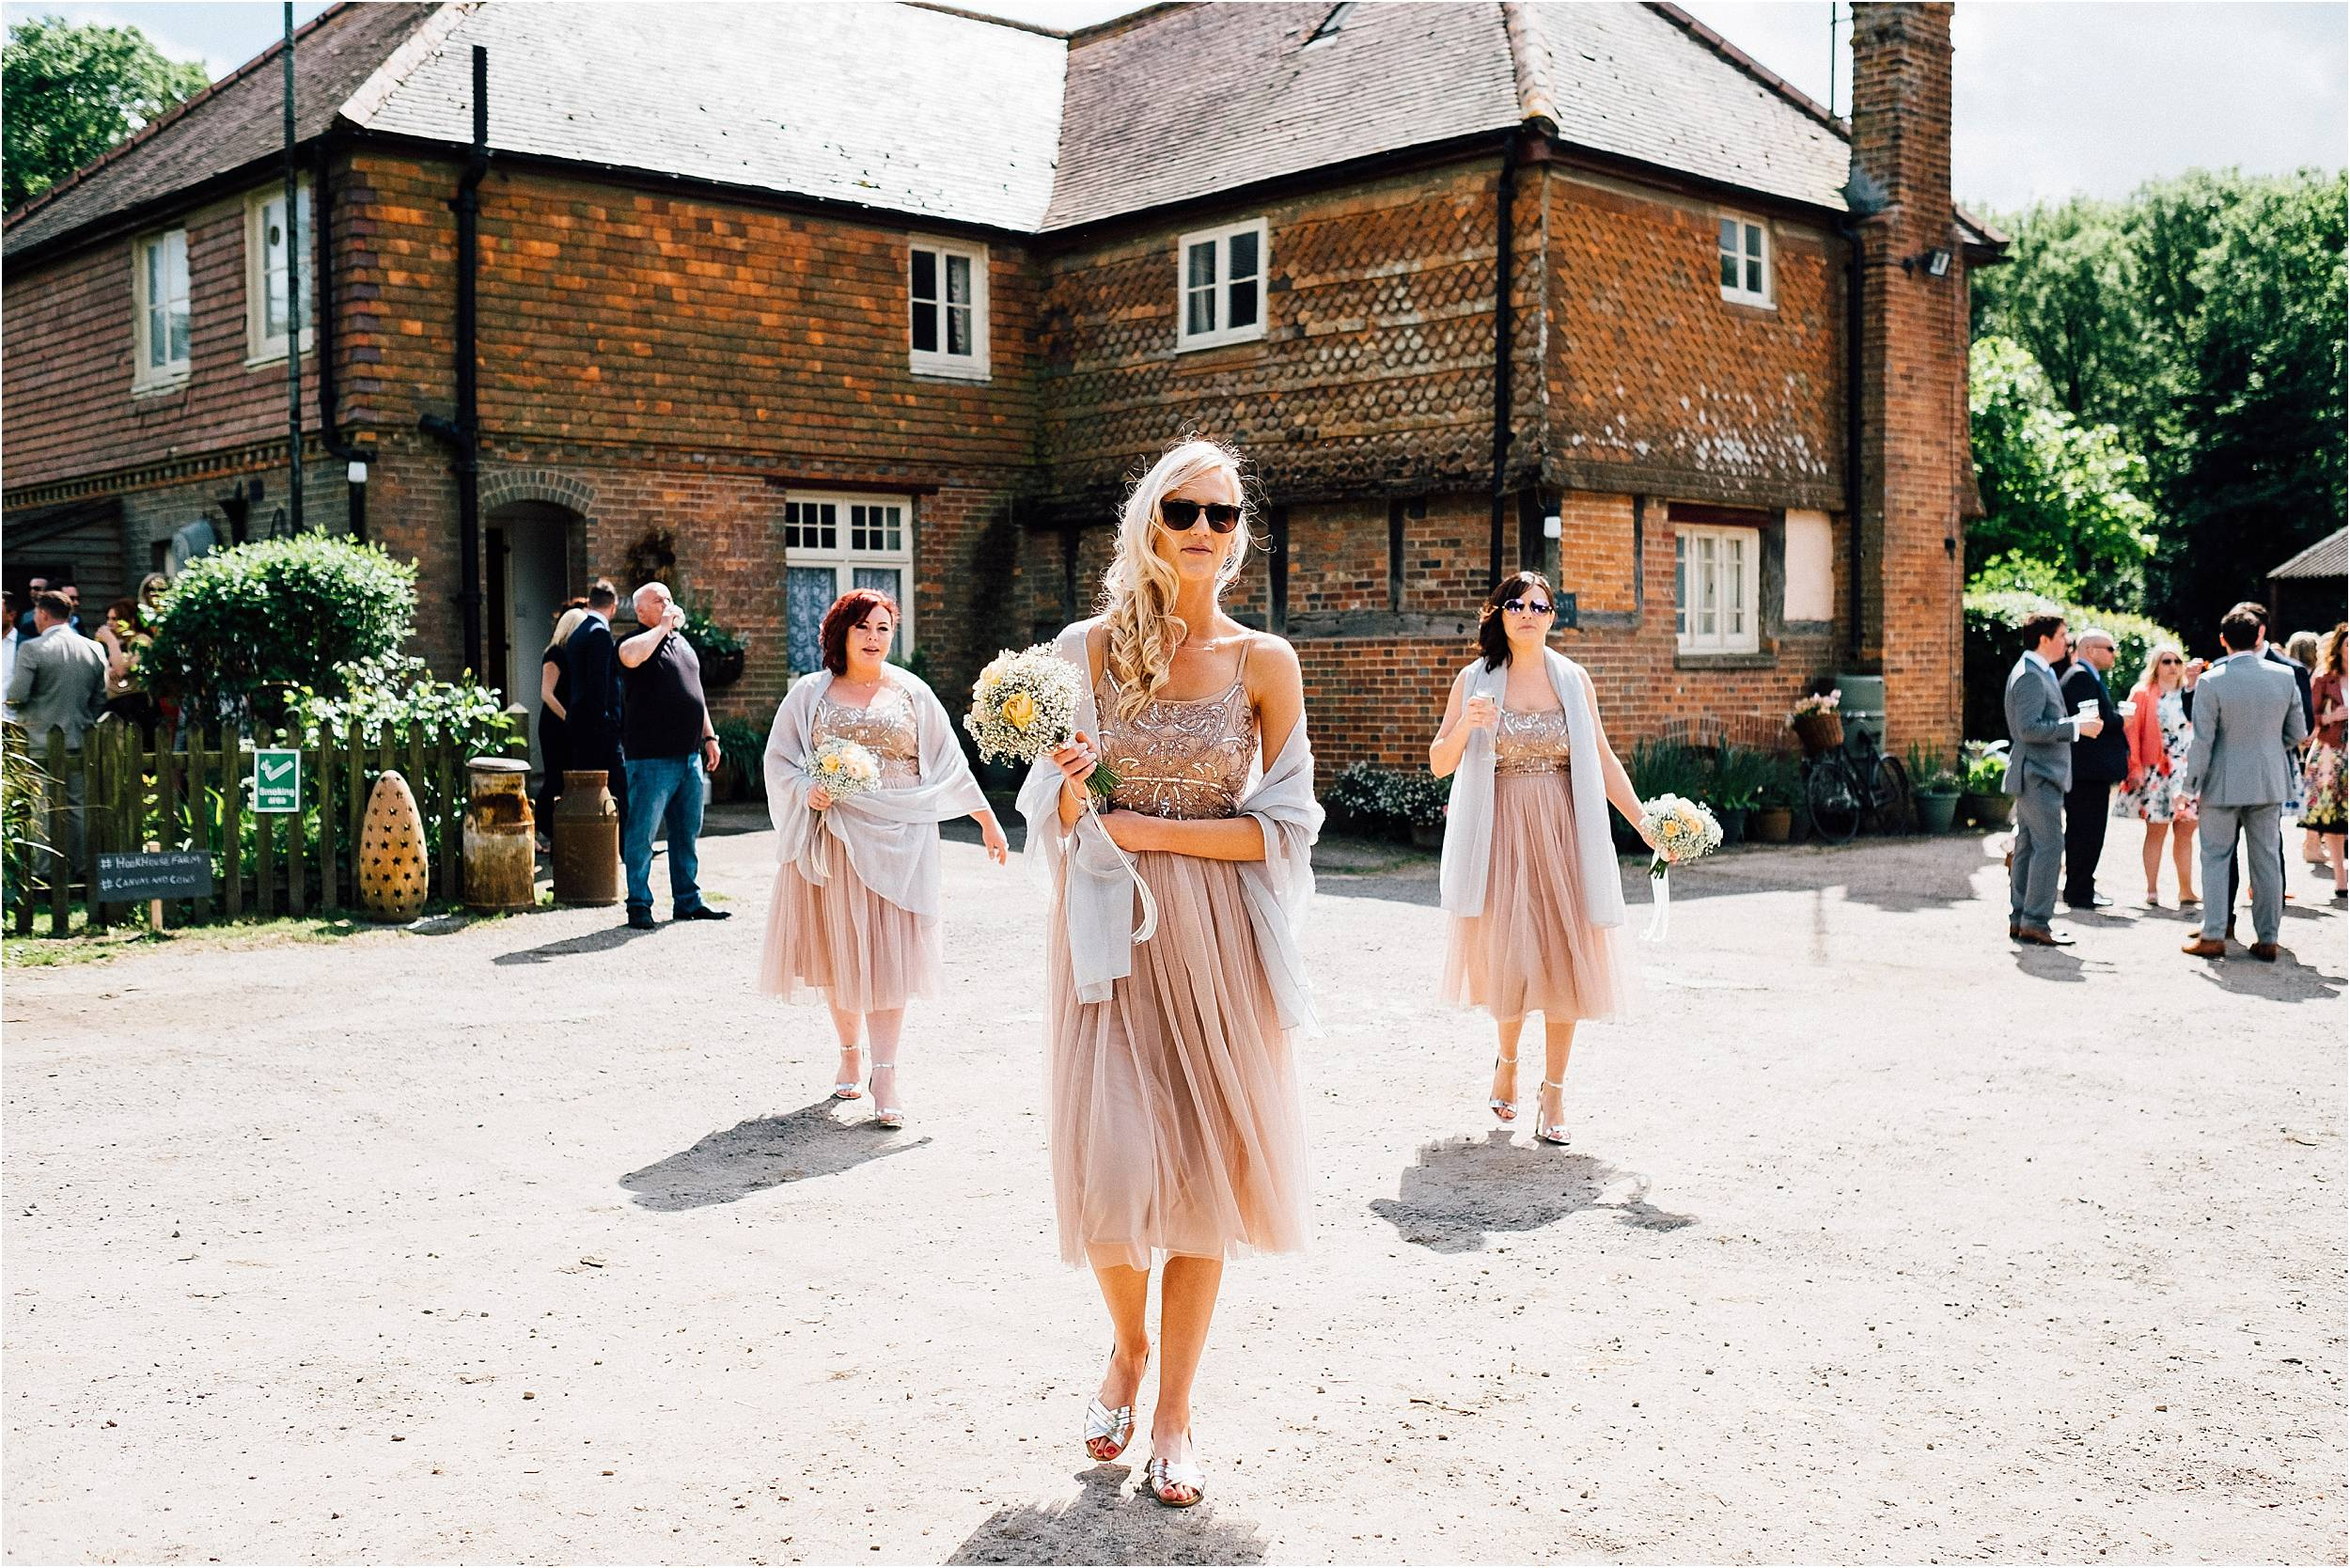 Surrey Hookhouse Farm Wedding Photographer_0089.jpg